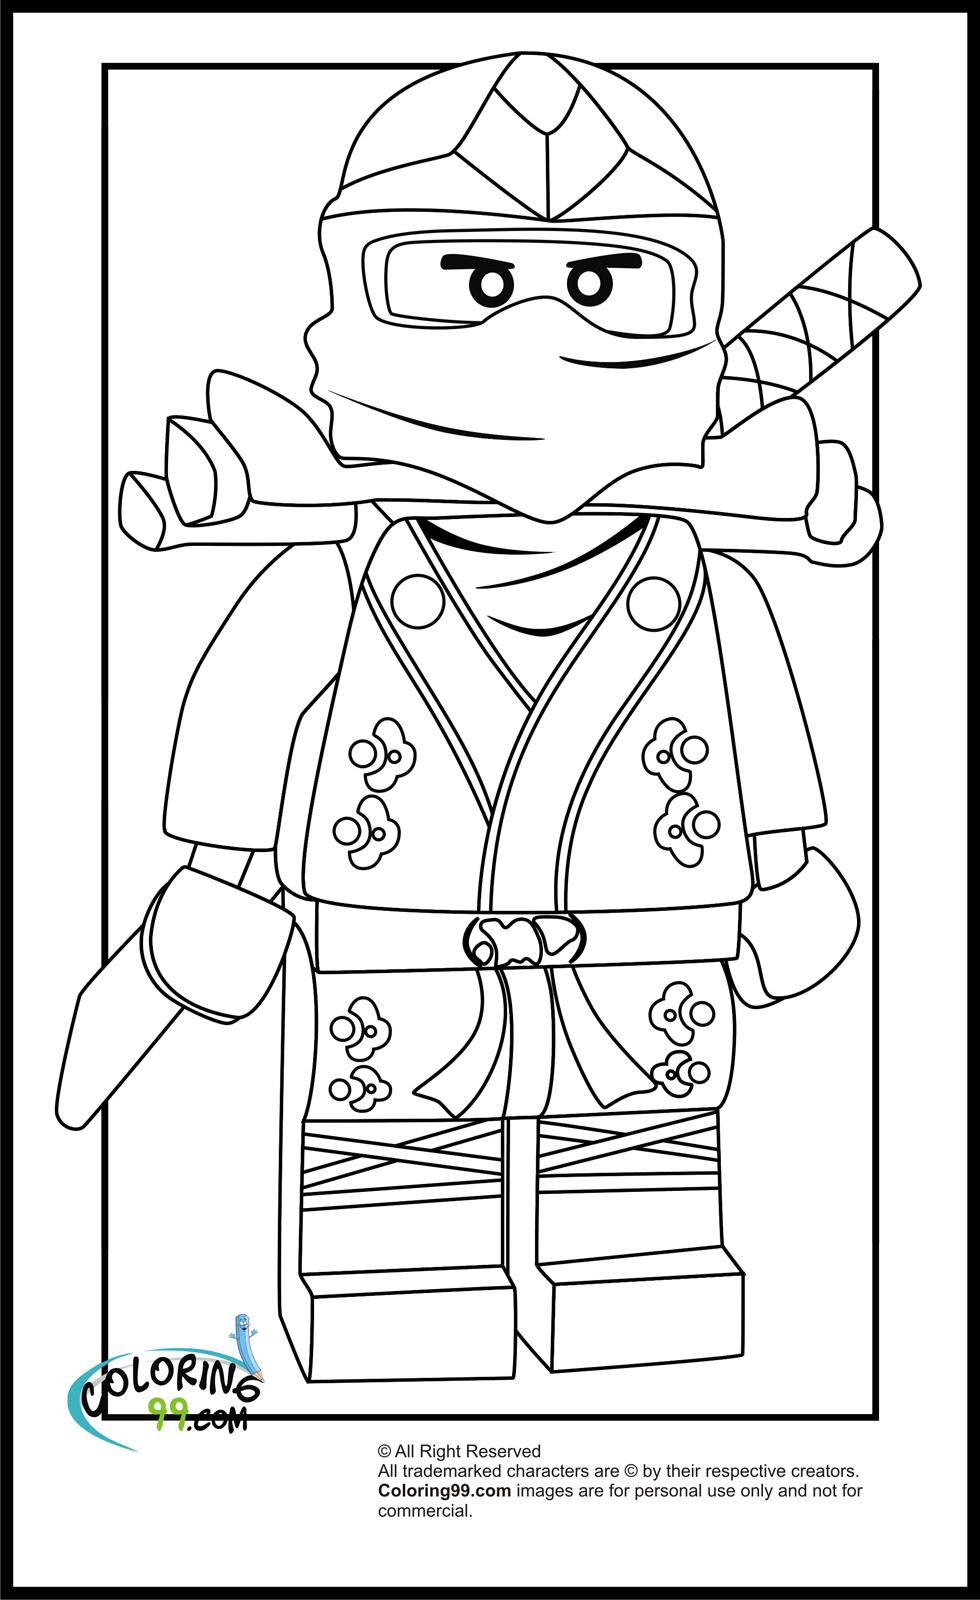 Coloriage ninjago gratuit - dessin a imprimer #24